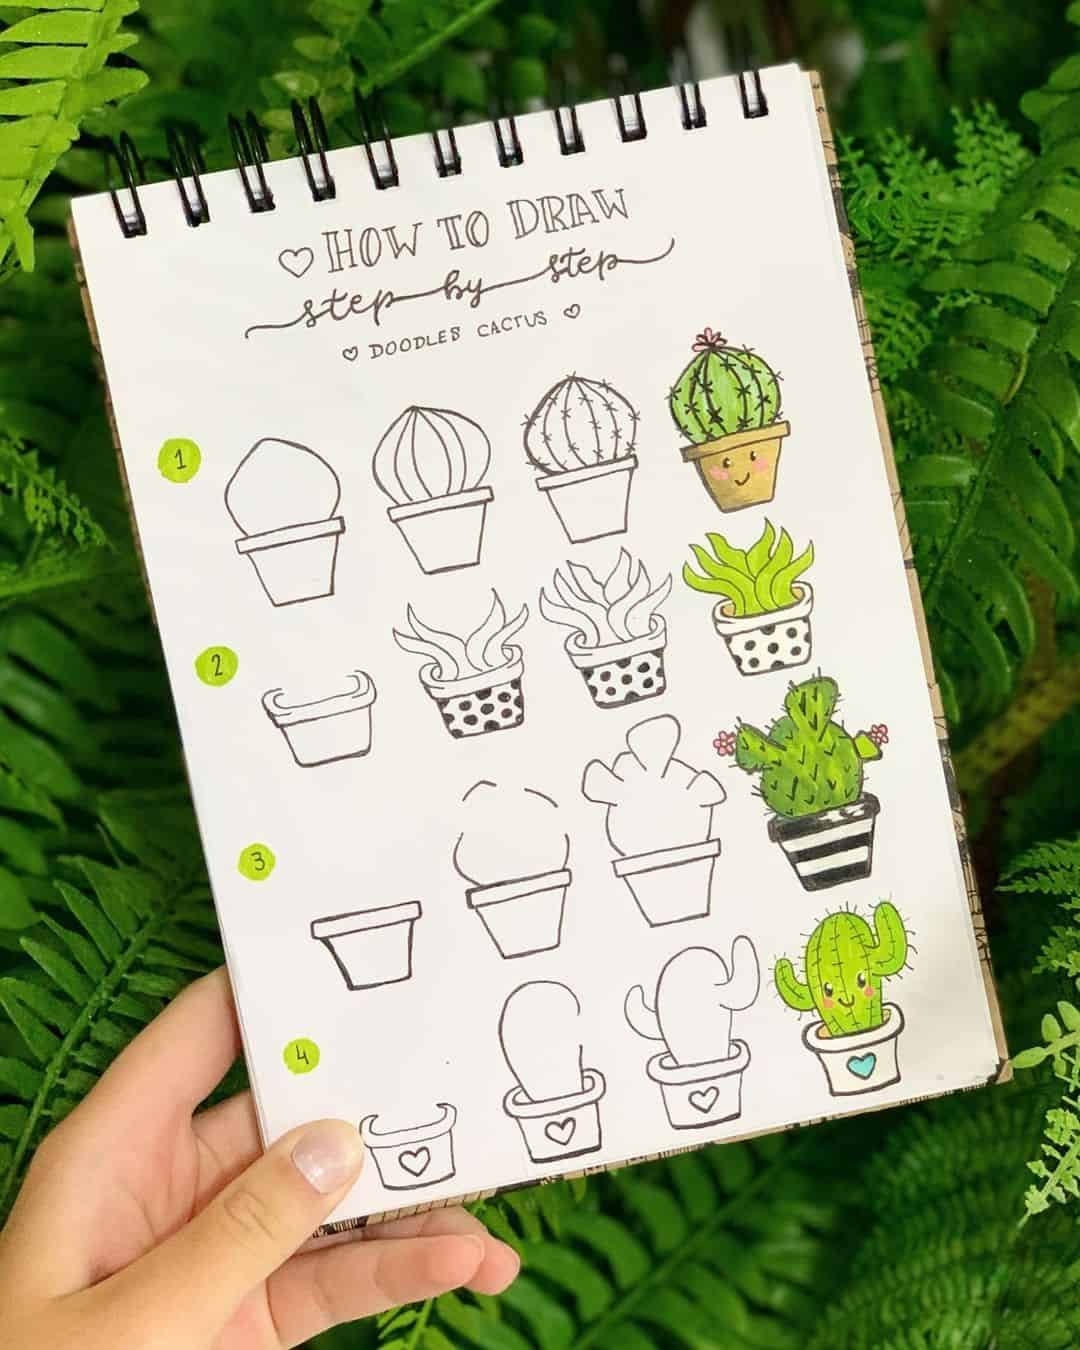 step-by-step bullet journal doodle tutorial - cactus plant doodles